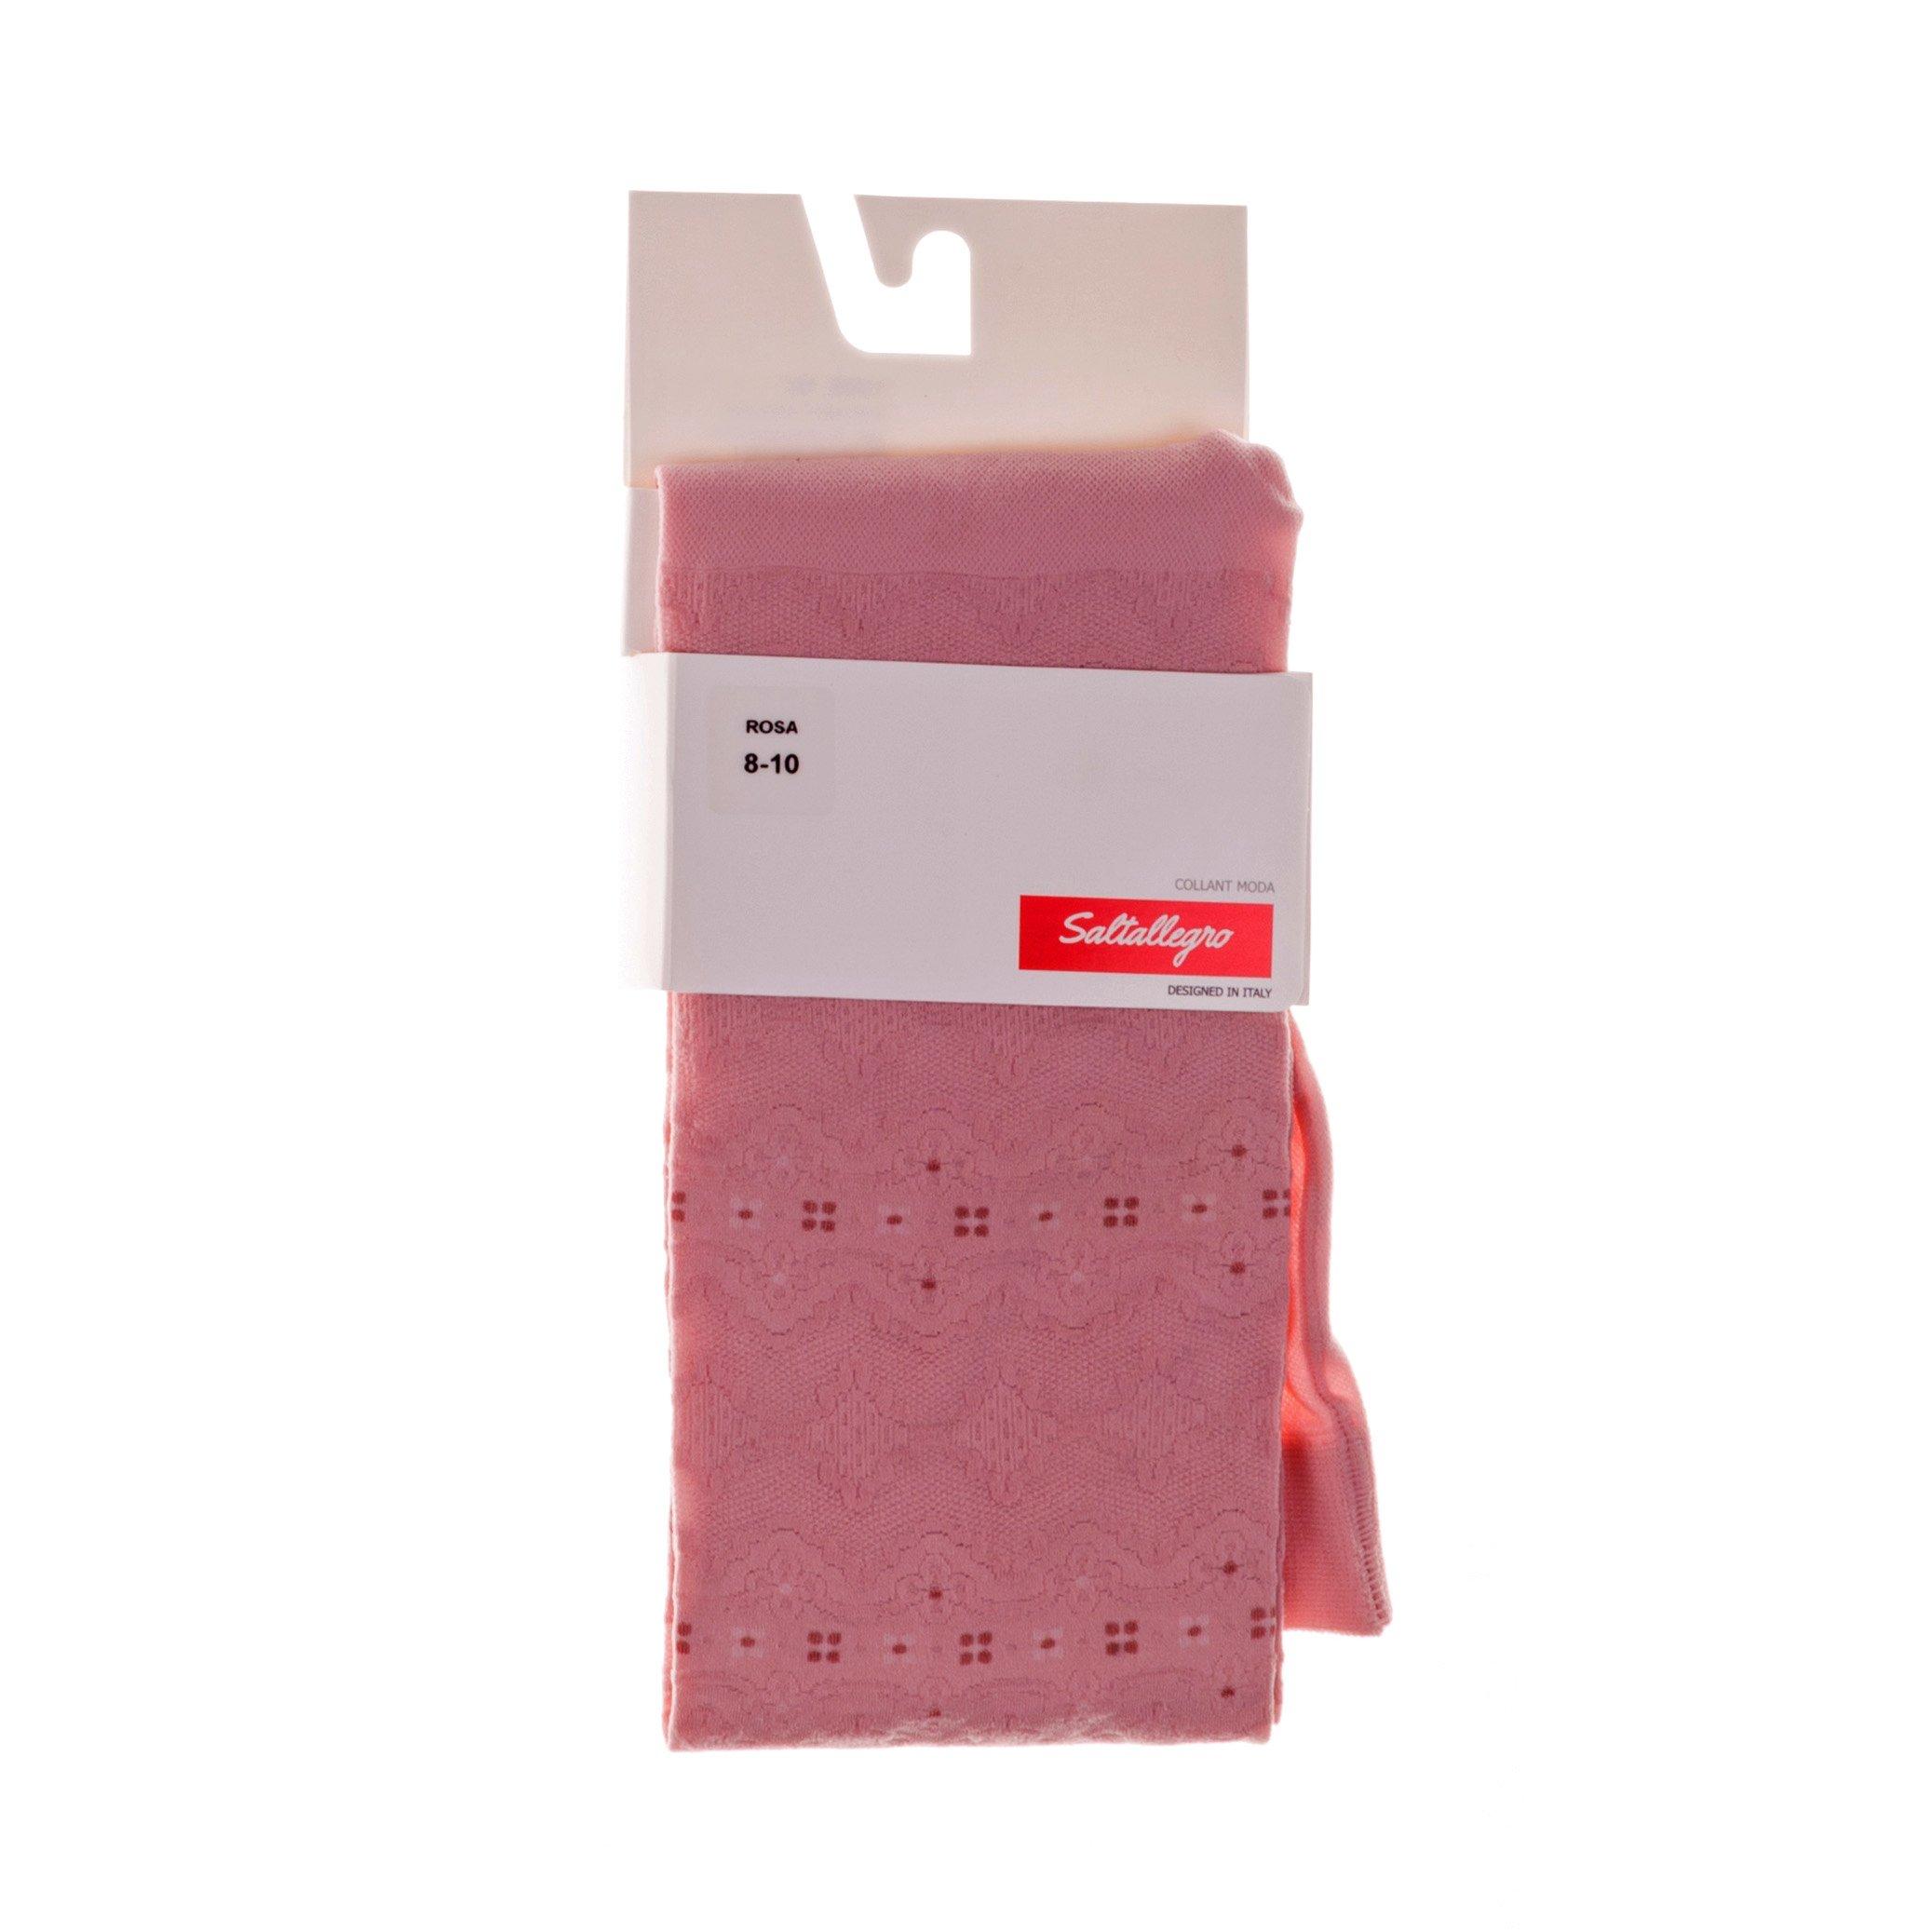 Dresuri copii Saltallegro roz